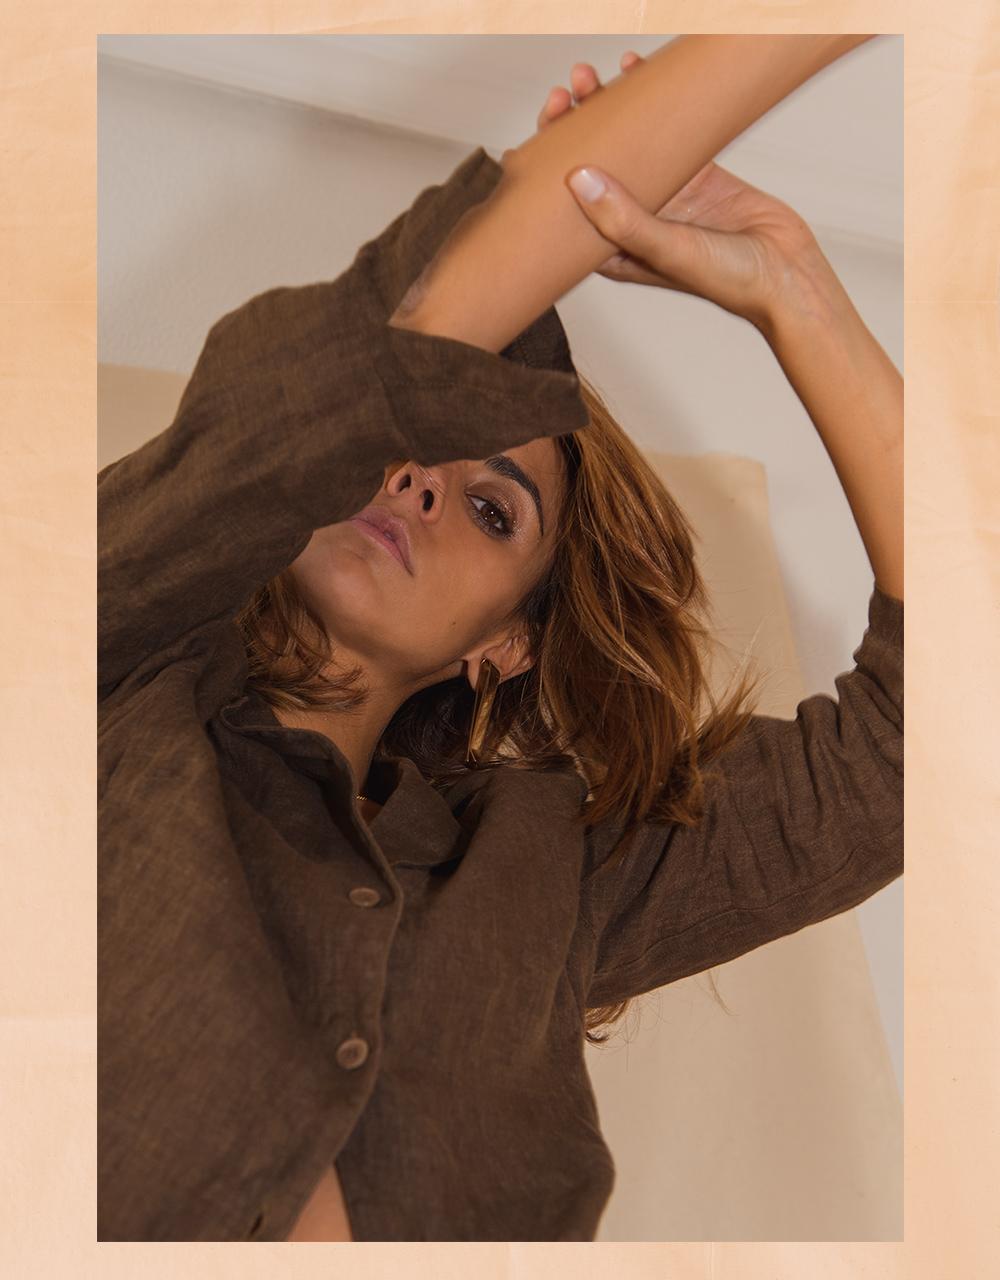 the-petticoat-editorial-night-light-by-giorgio-armani-beauty-11